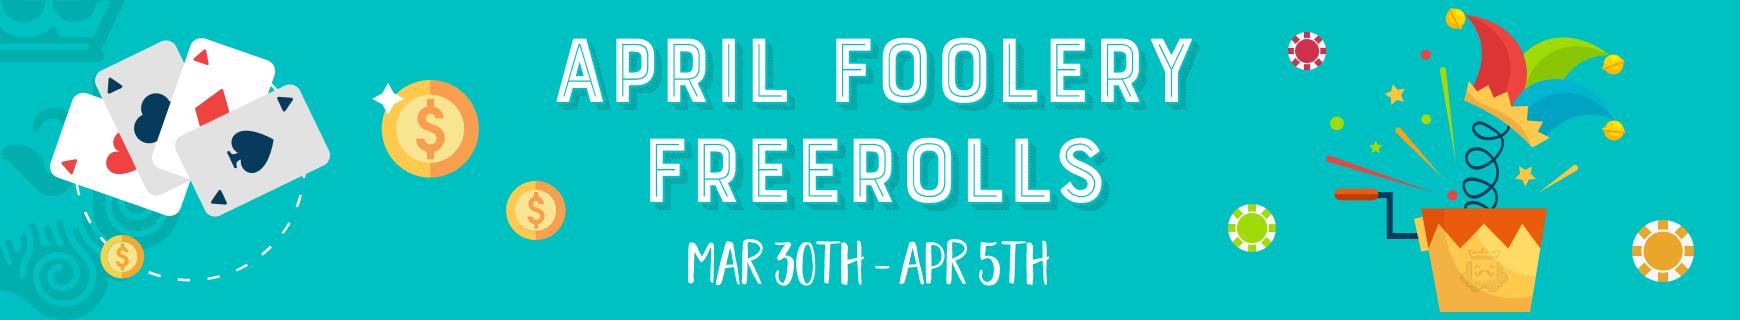 April foolerly freerolls 2020   dashboard %28870 x 160%29 2x